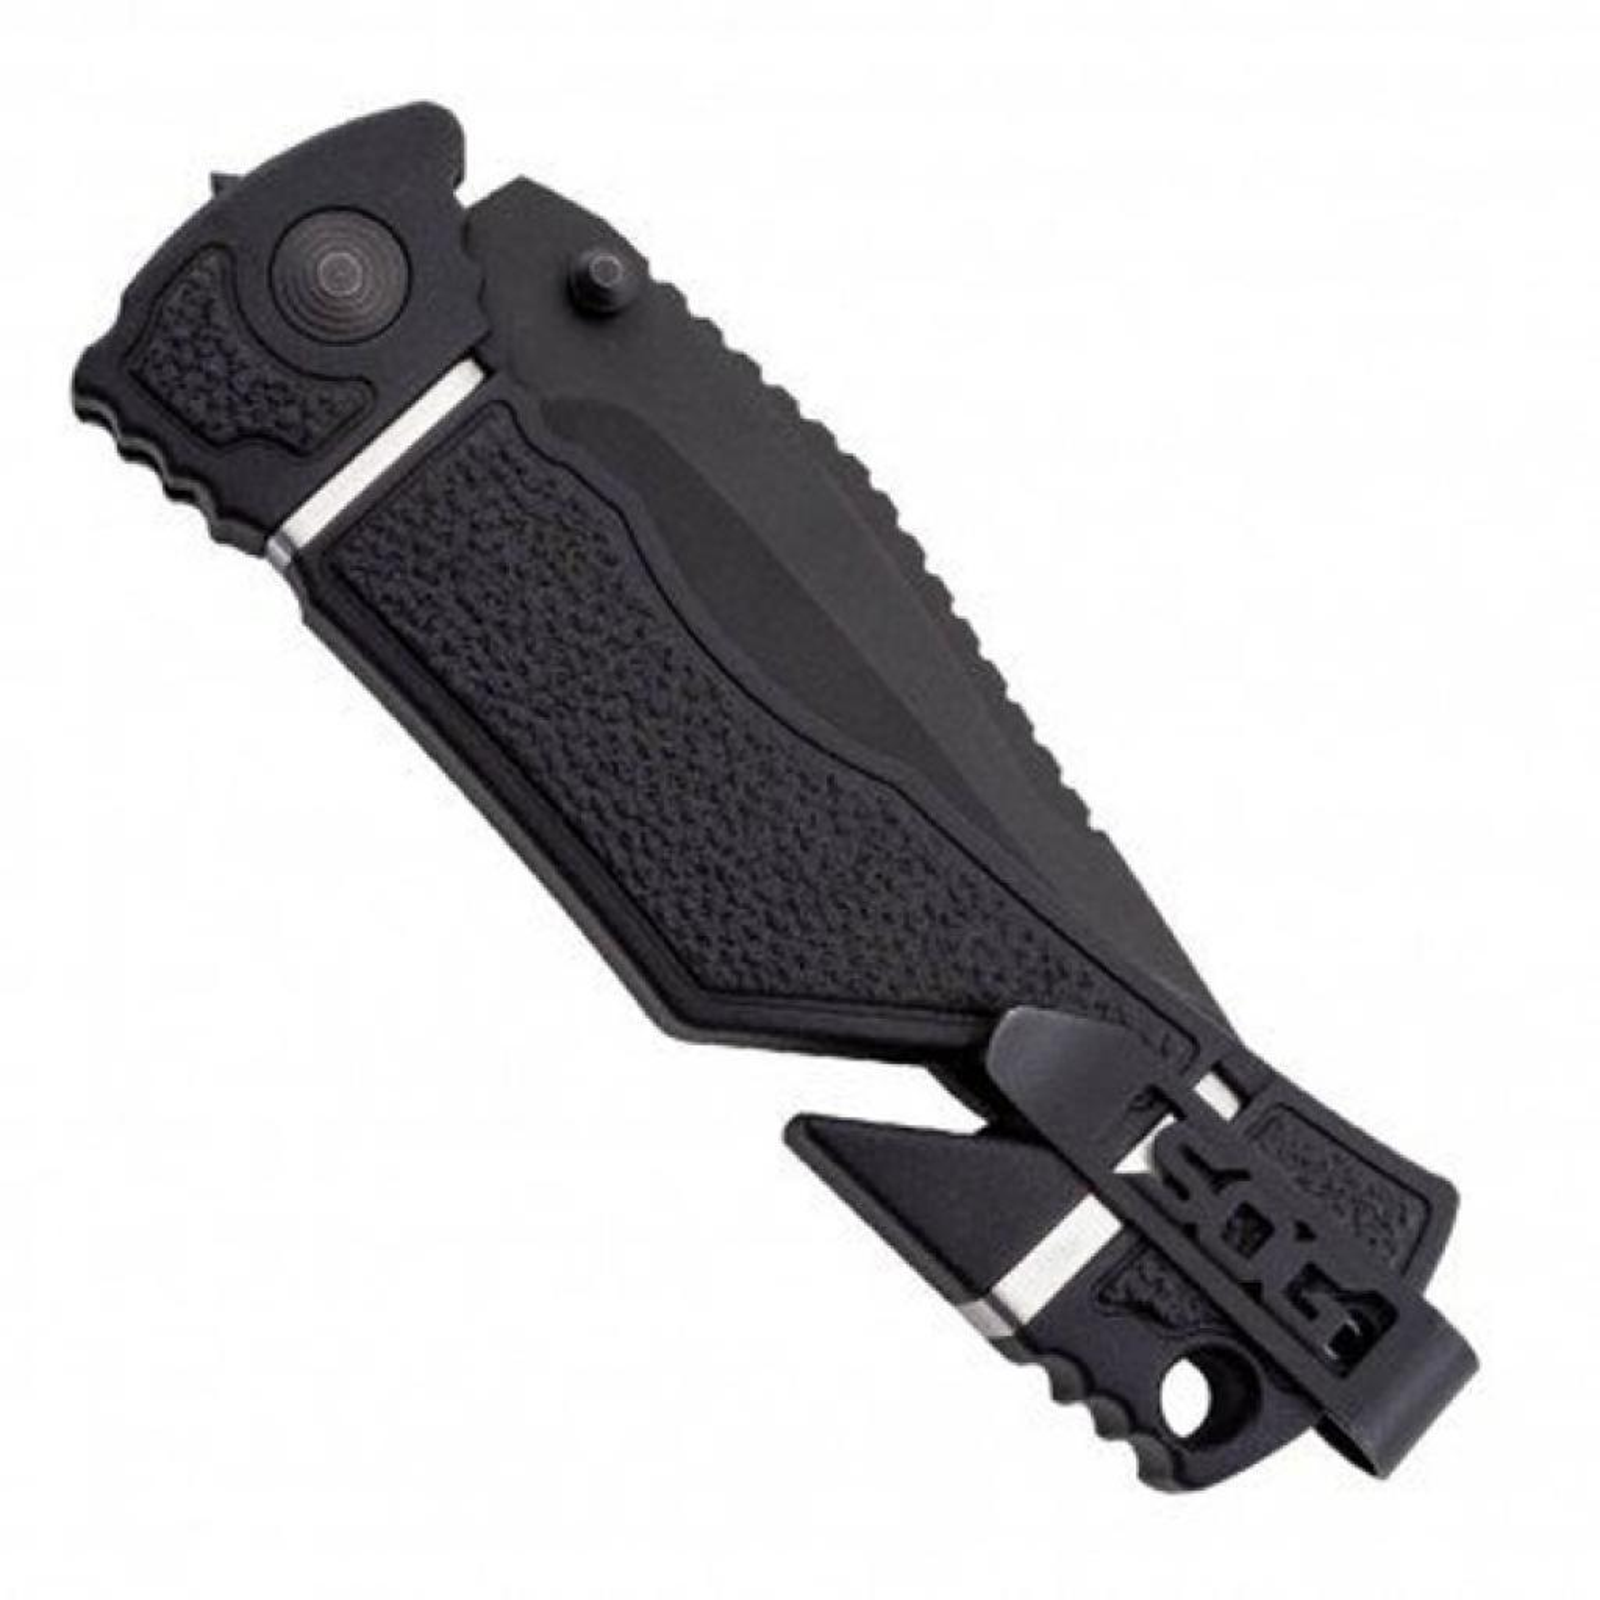 Нож SOG Trident Elite Black Blade Serrated (TF106-BX) изображение 4